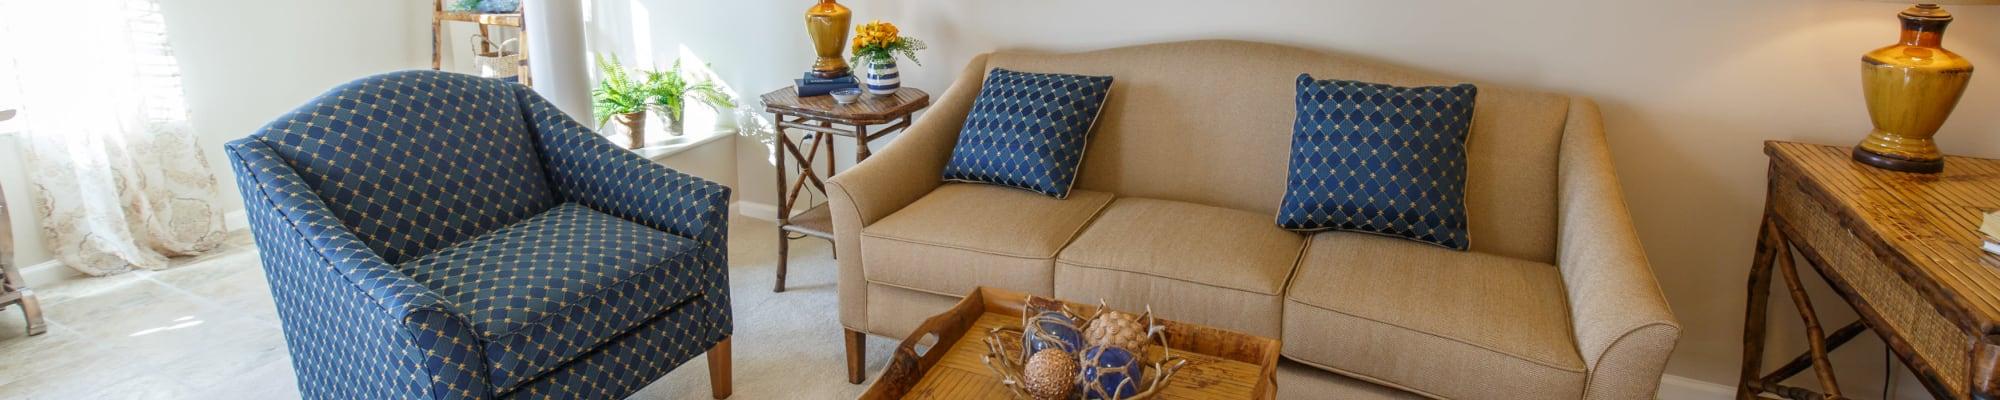 Floor Plans & Pricing at Keystone Place at Terra Bella in Land O' Lakes, Florida